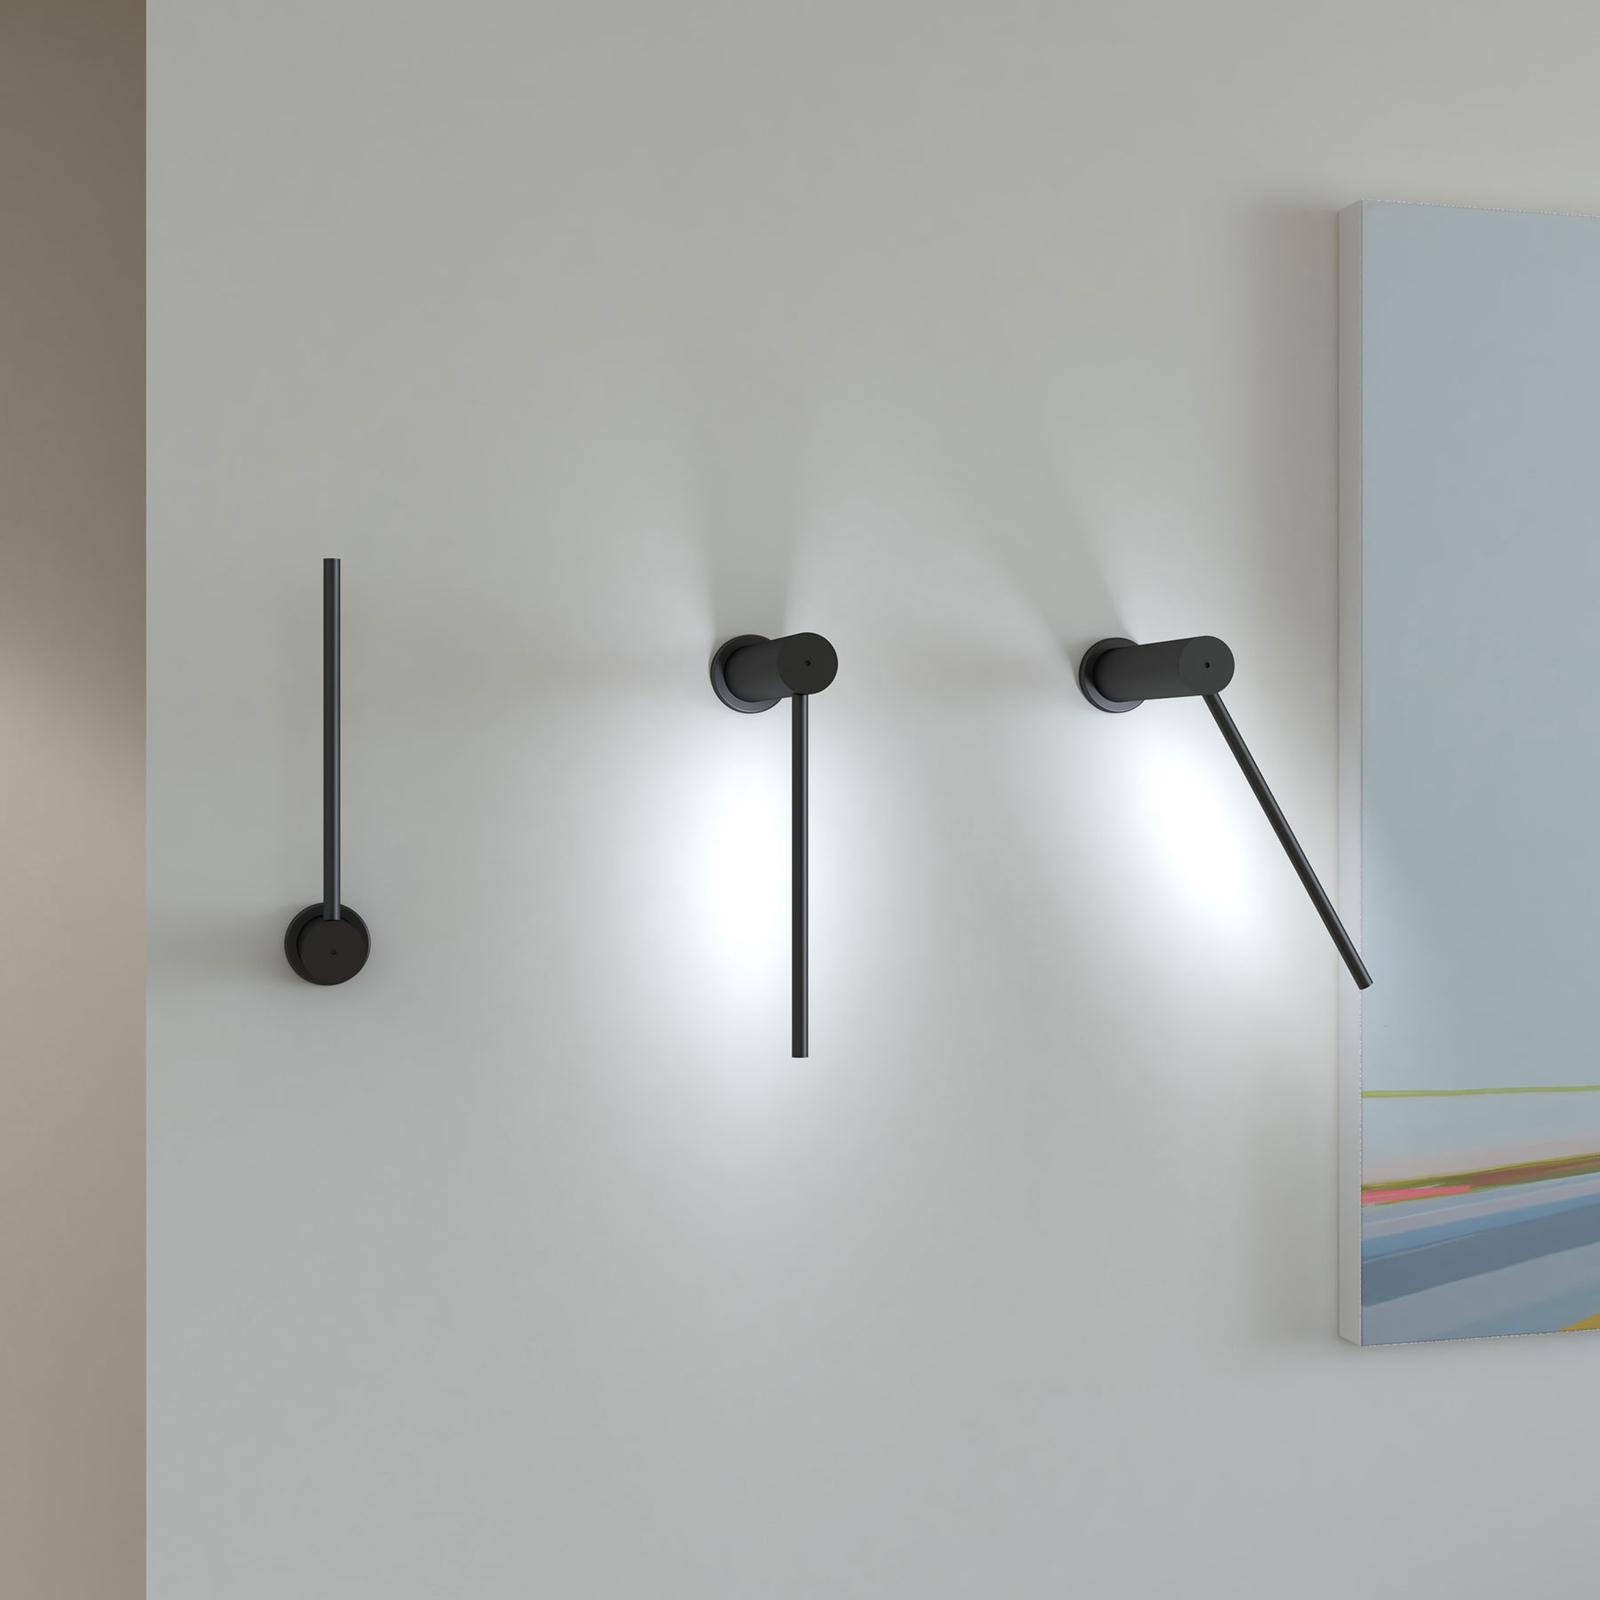 Martinelli Luce Mosca LED-Wandleuchte 20cm schwarz